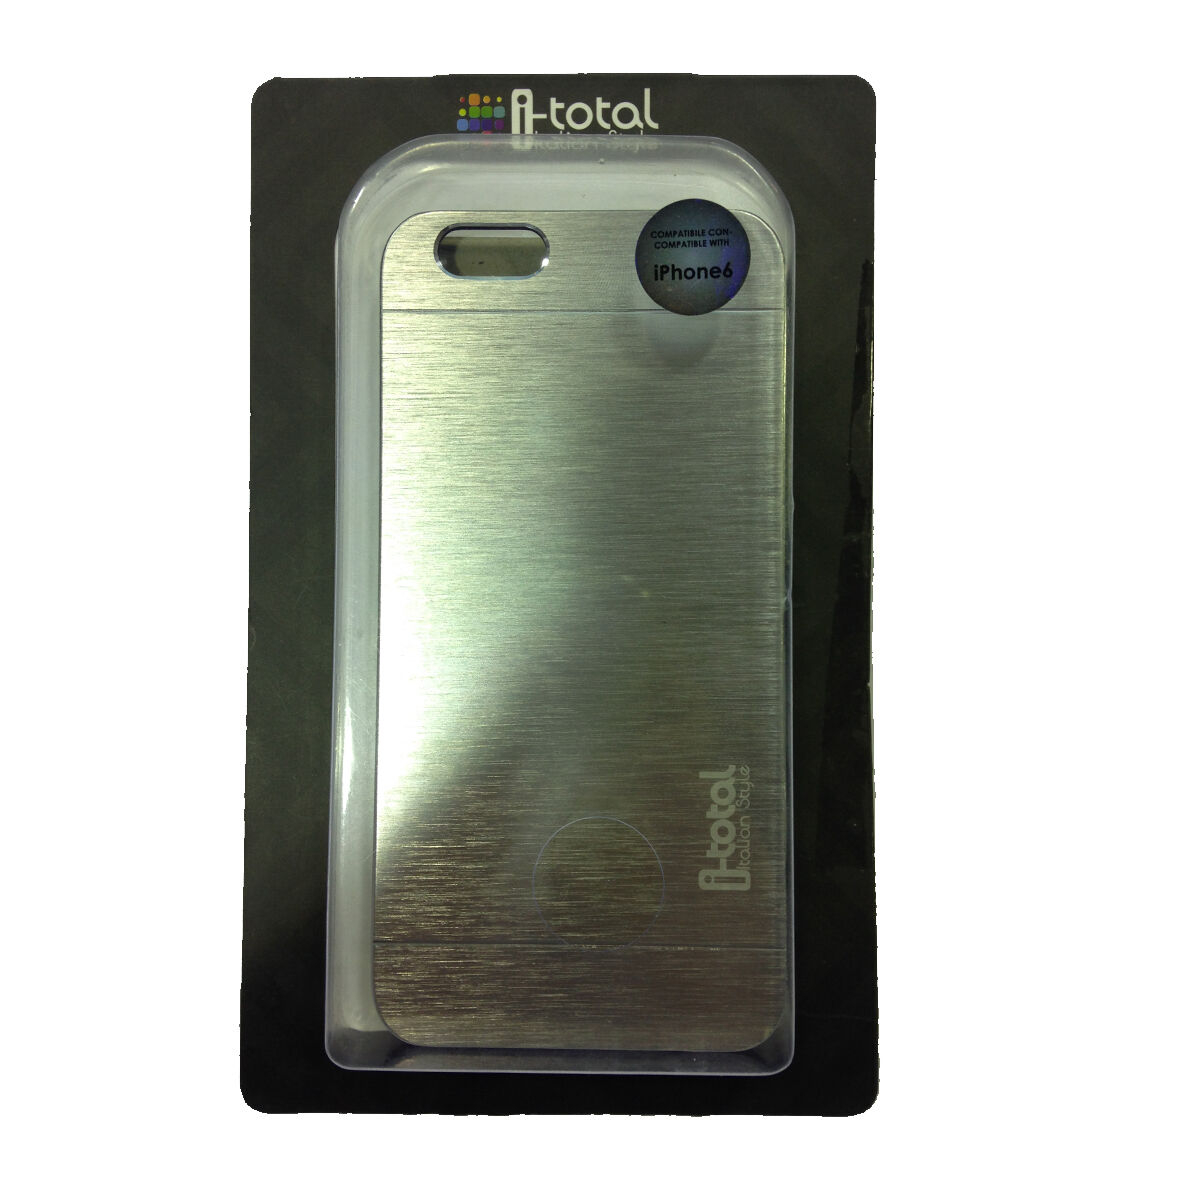 COVER mascherina iphone 6 in alluminio rigida in plastica I-TOTAL